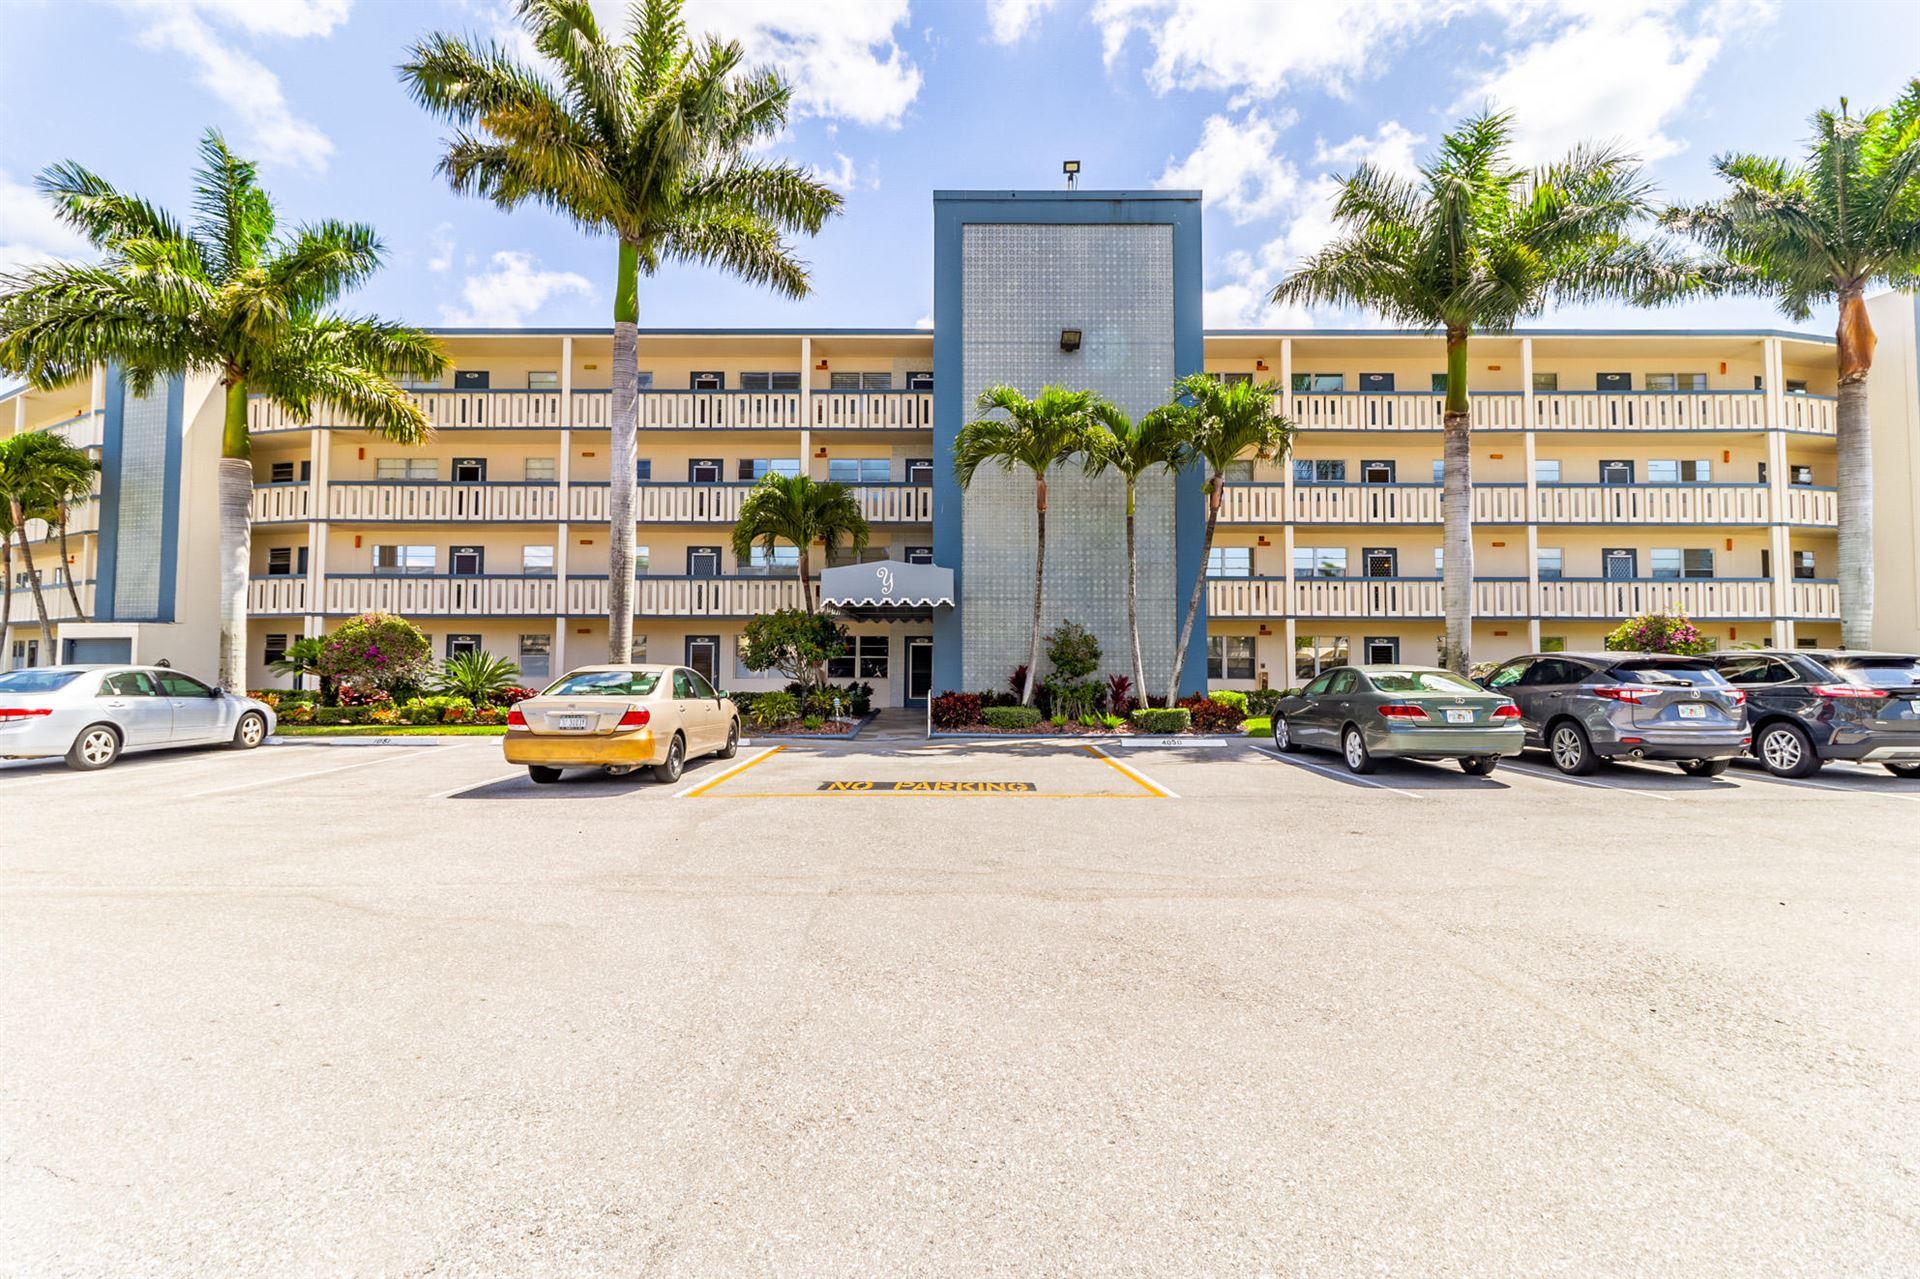 3051 Yarmouth C, Boca Raton, FL 33434 - MLS#: RX-10707822